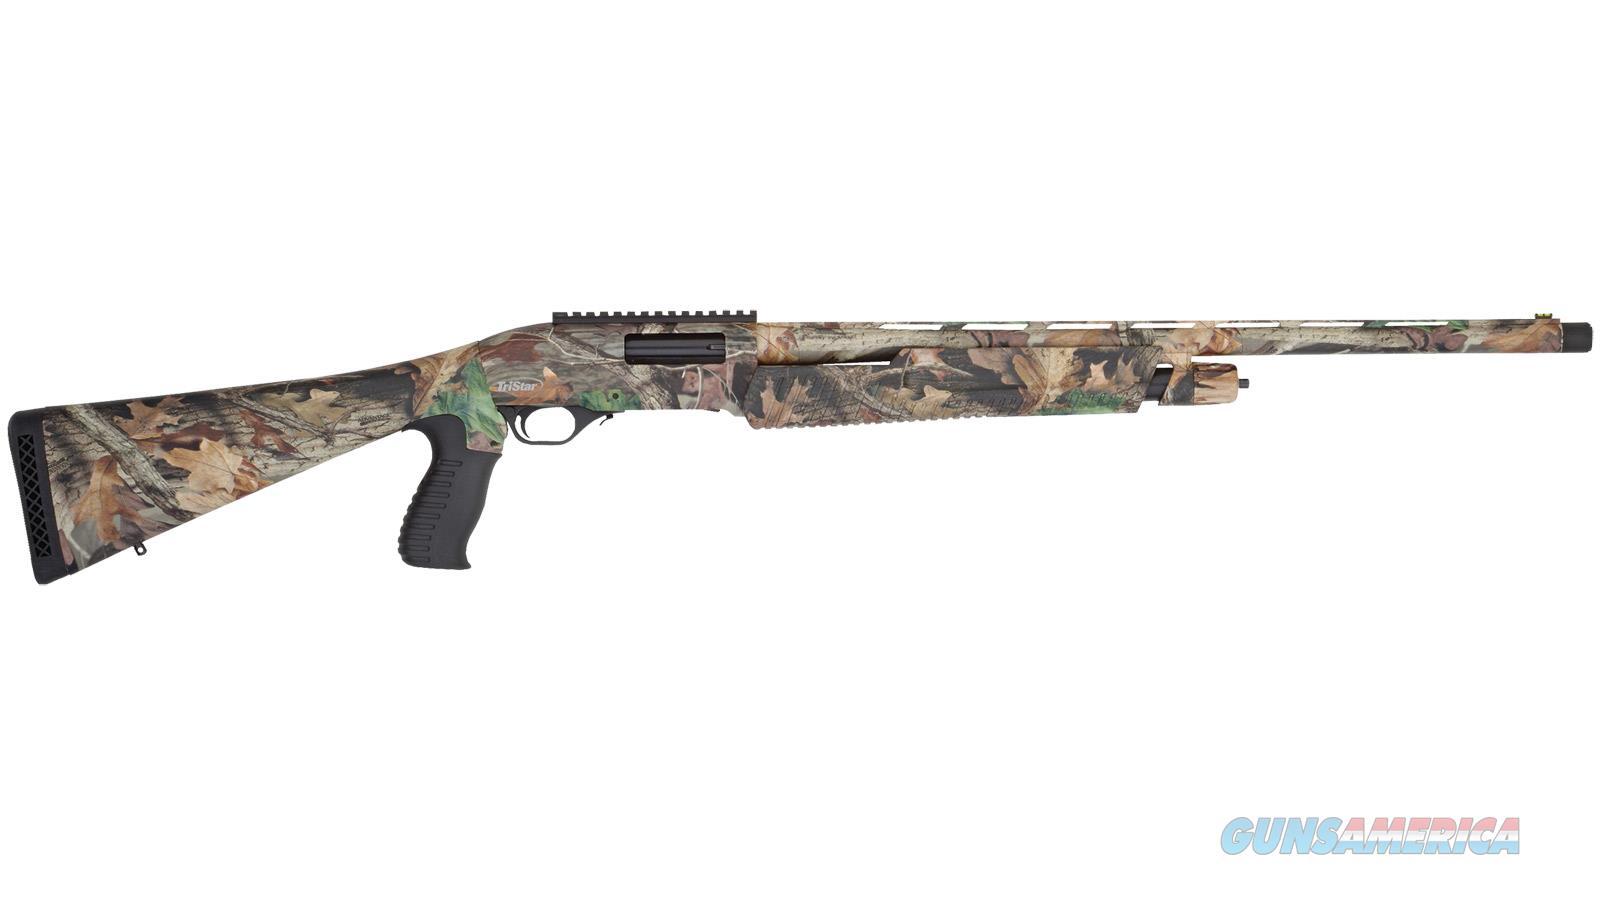 "Tristar Cobra Ii Pump 12Ga. 24""Vr Ct-4T Ad. Timber Turkey 23126  Guns > Shotguns > TU Misc Shotguns"